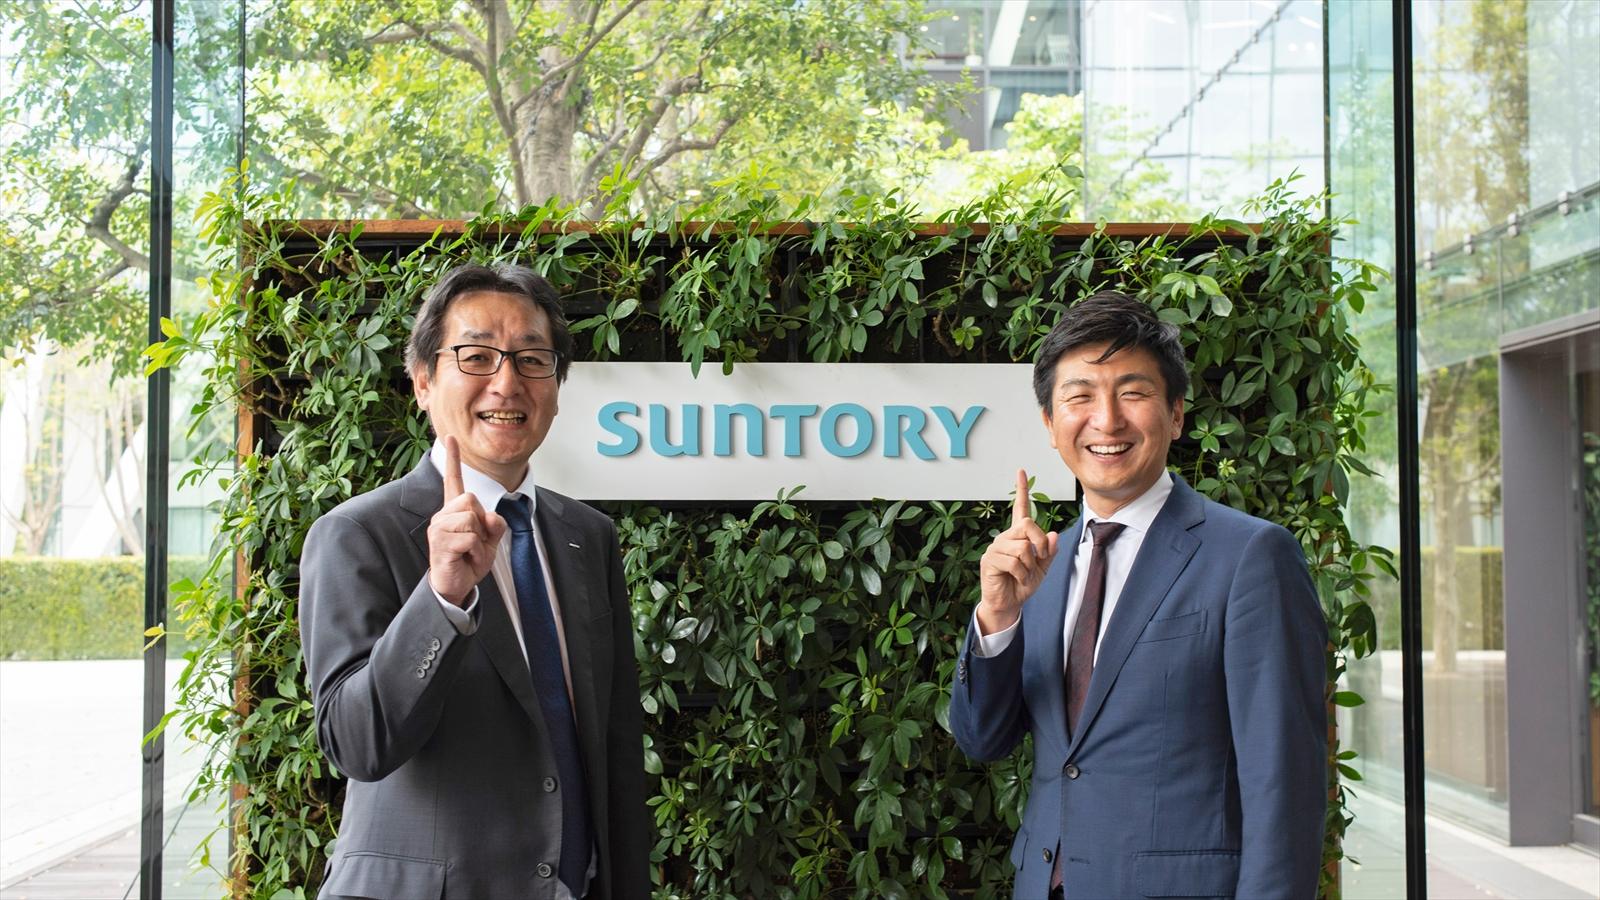 「YATTE MINAHARE」精神で、真の日本発グローバル企業を目指す(サントリーホールディングス)